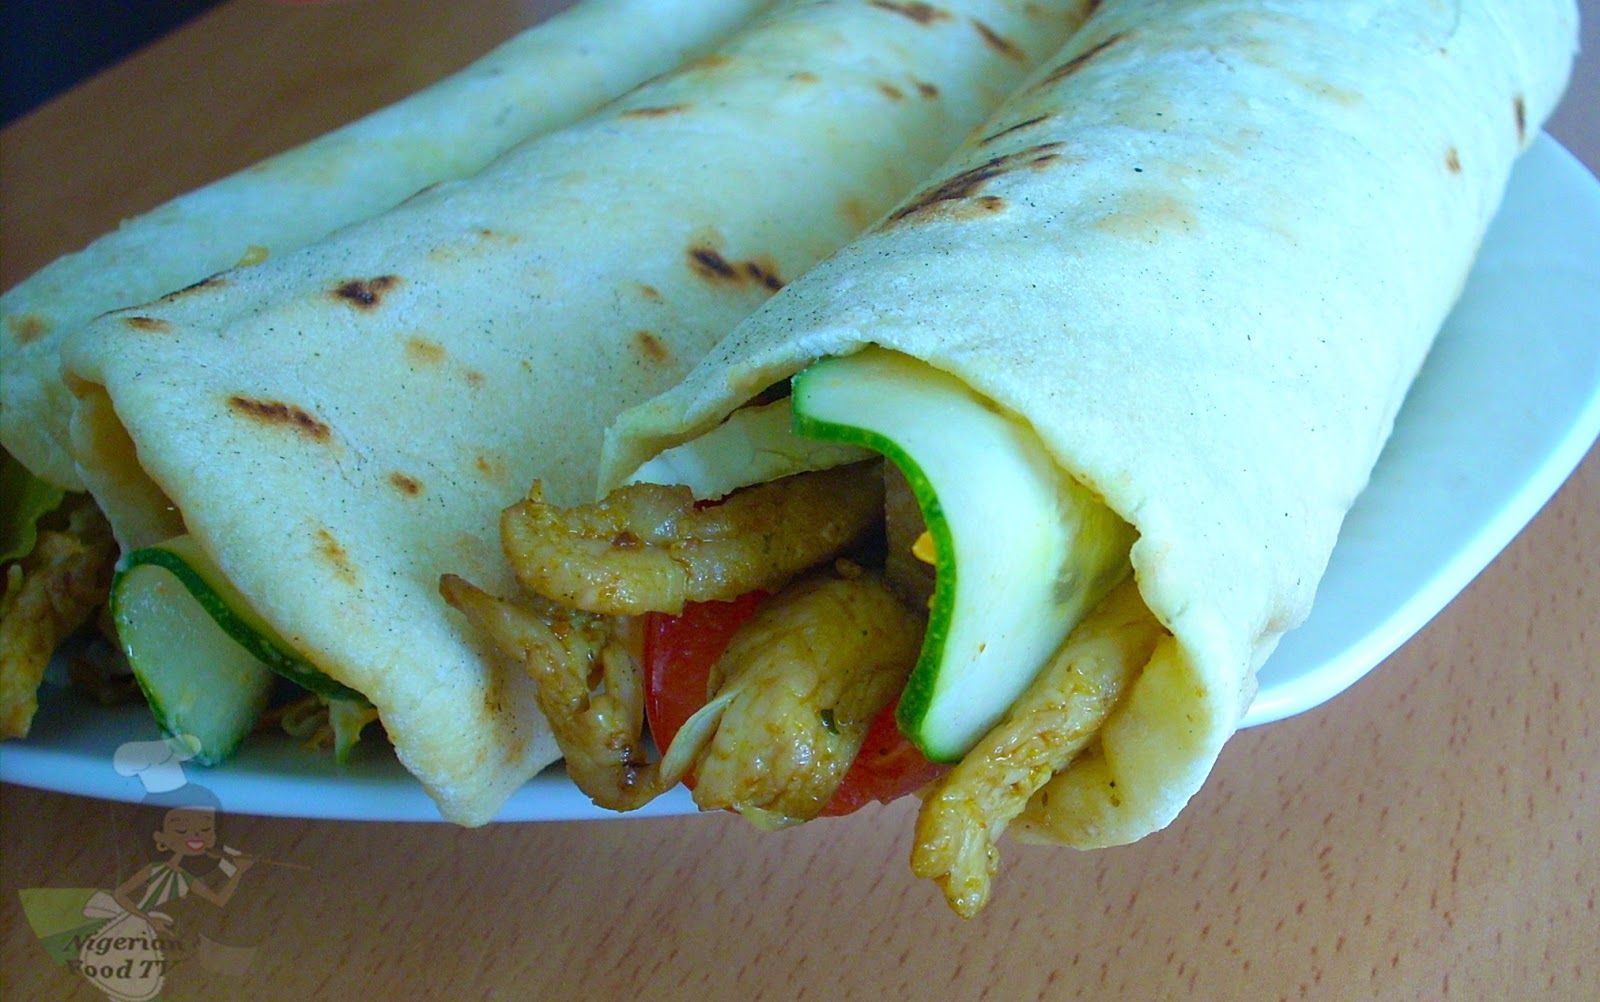 nigerian shawarma,Nigerian Food Recipes, Nigerian Recipes, Nigerian Food, Nigerian Food TV